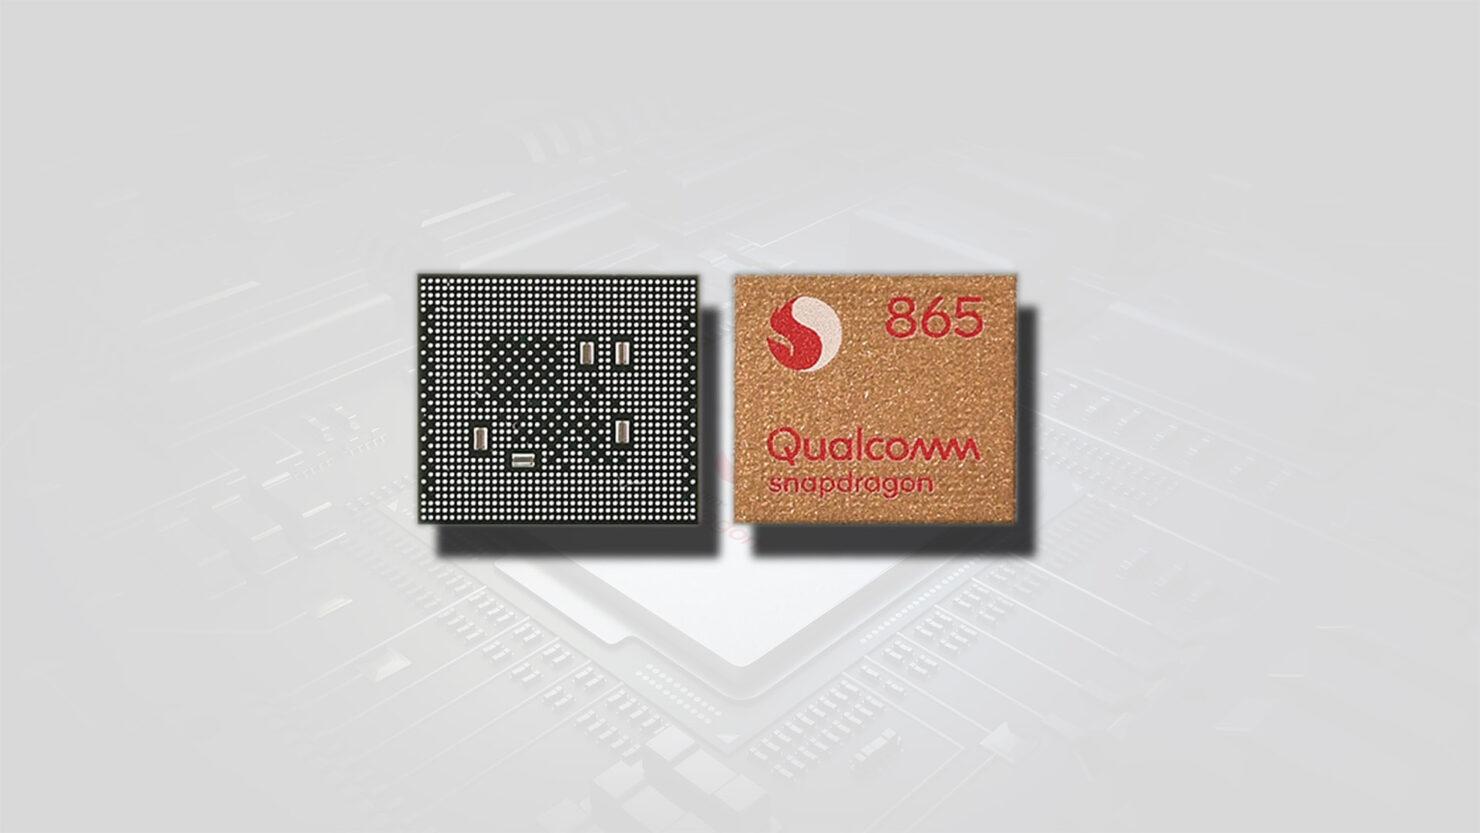 Qualcomm Snapdragon 865 Development Took Three Years to Complete